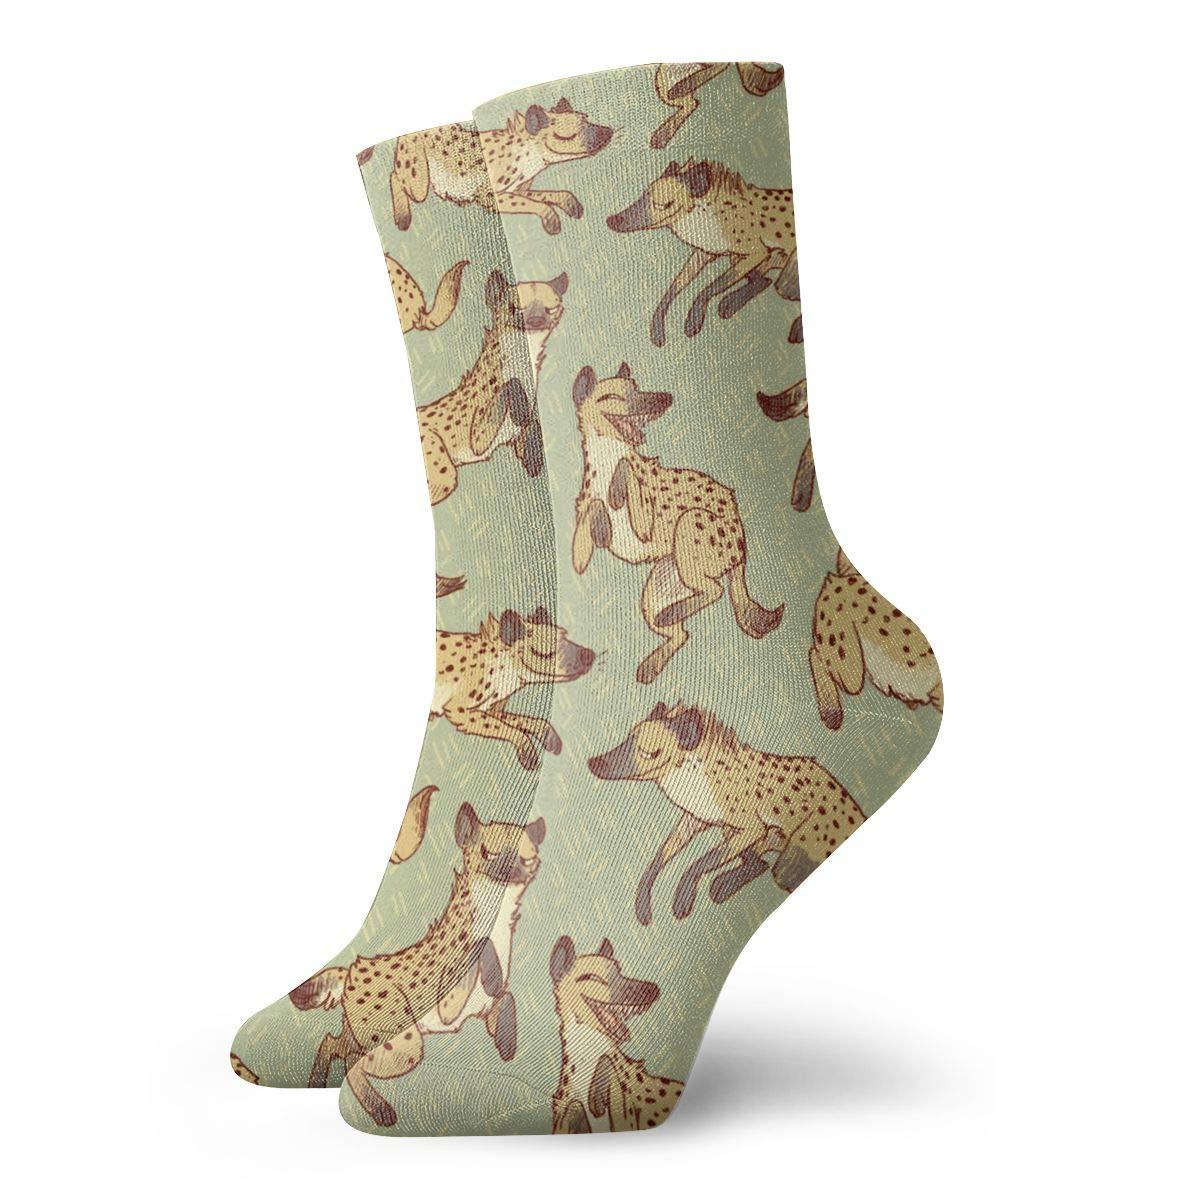 Hyena Patterns Unisex Funny Casual Crew Socks Athletic Socks For Boys Girls Kids Teenagers